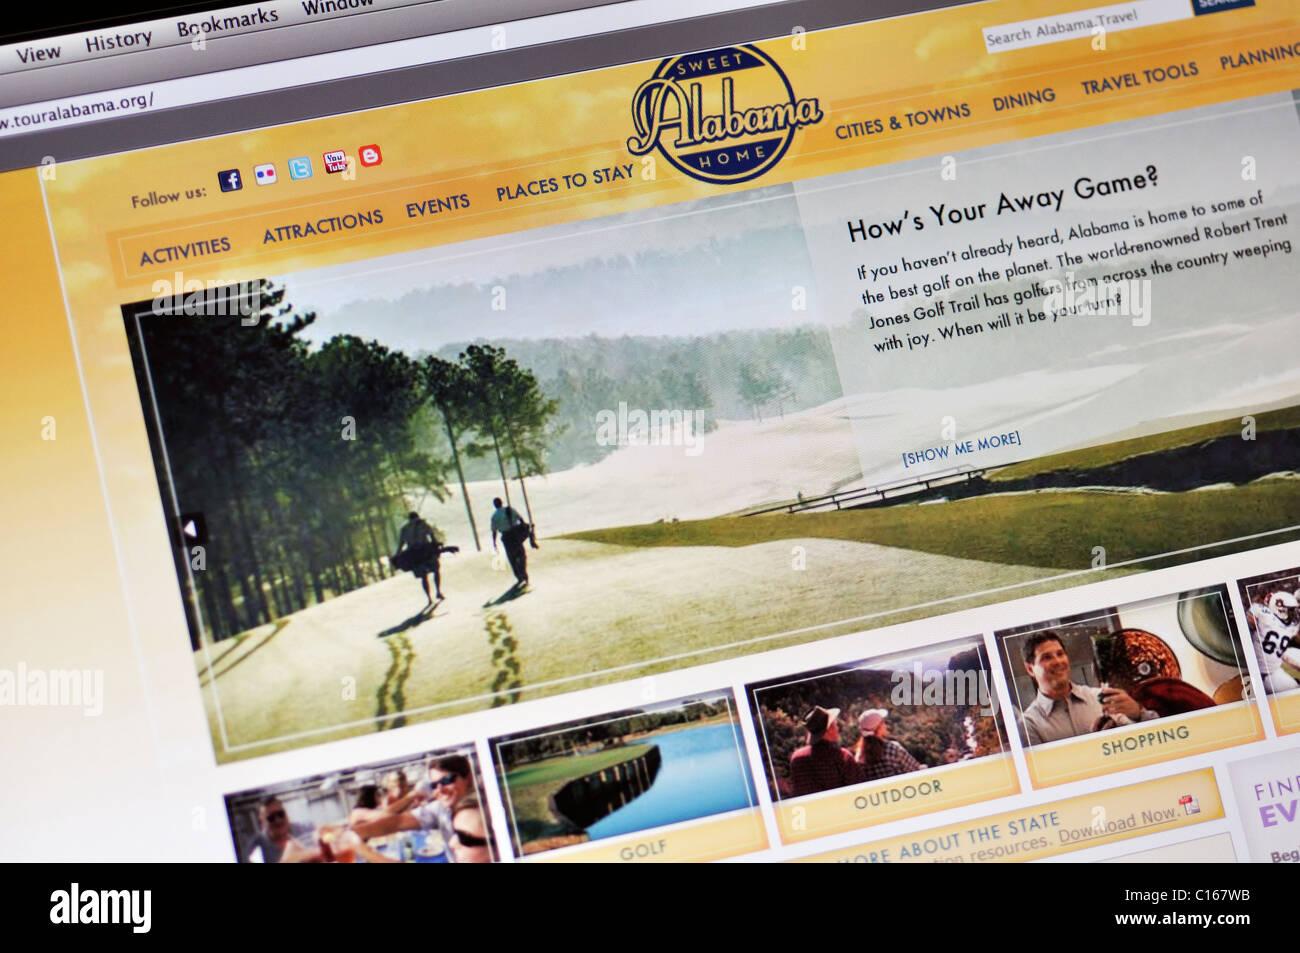 Alabama official state tourism website - Stock Image